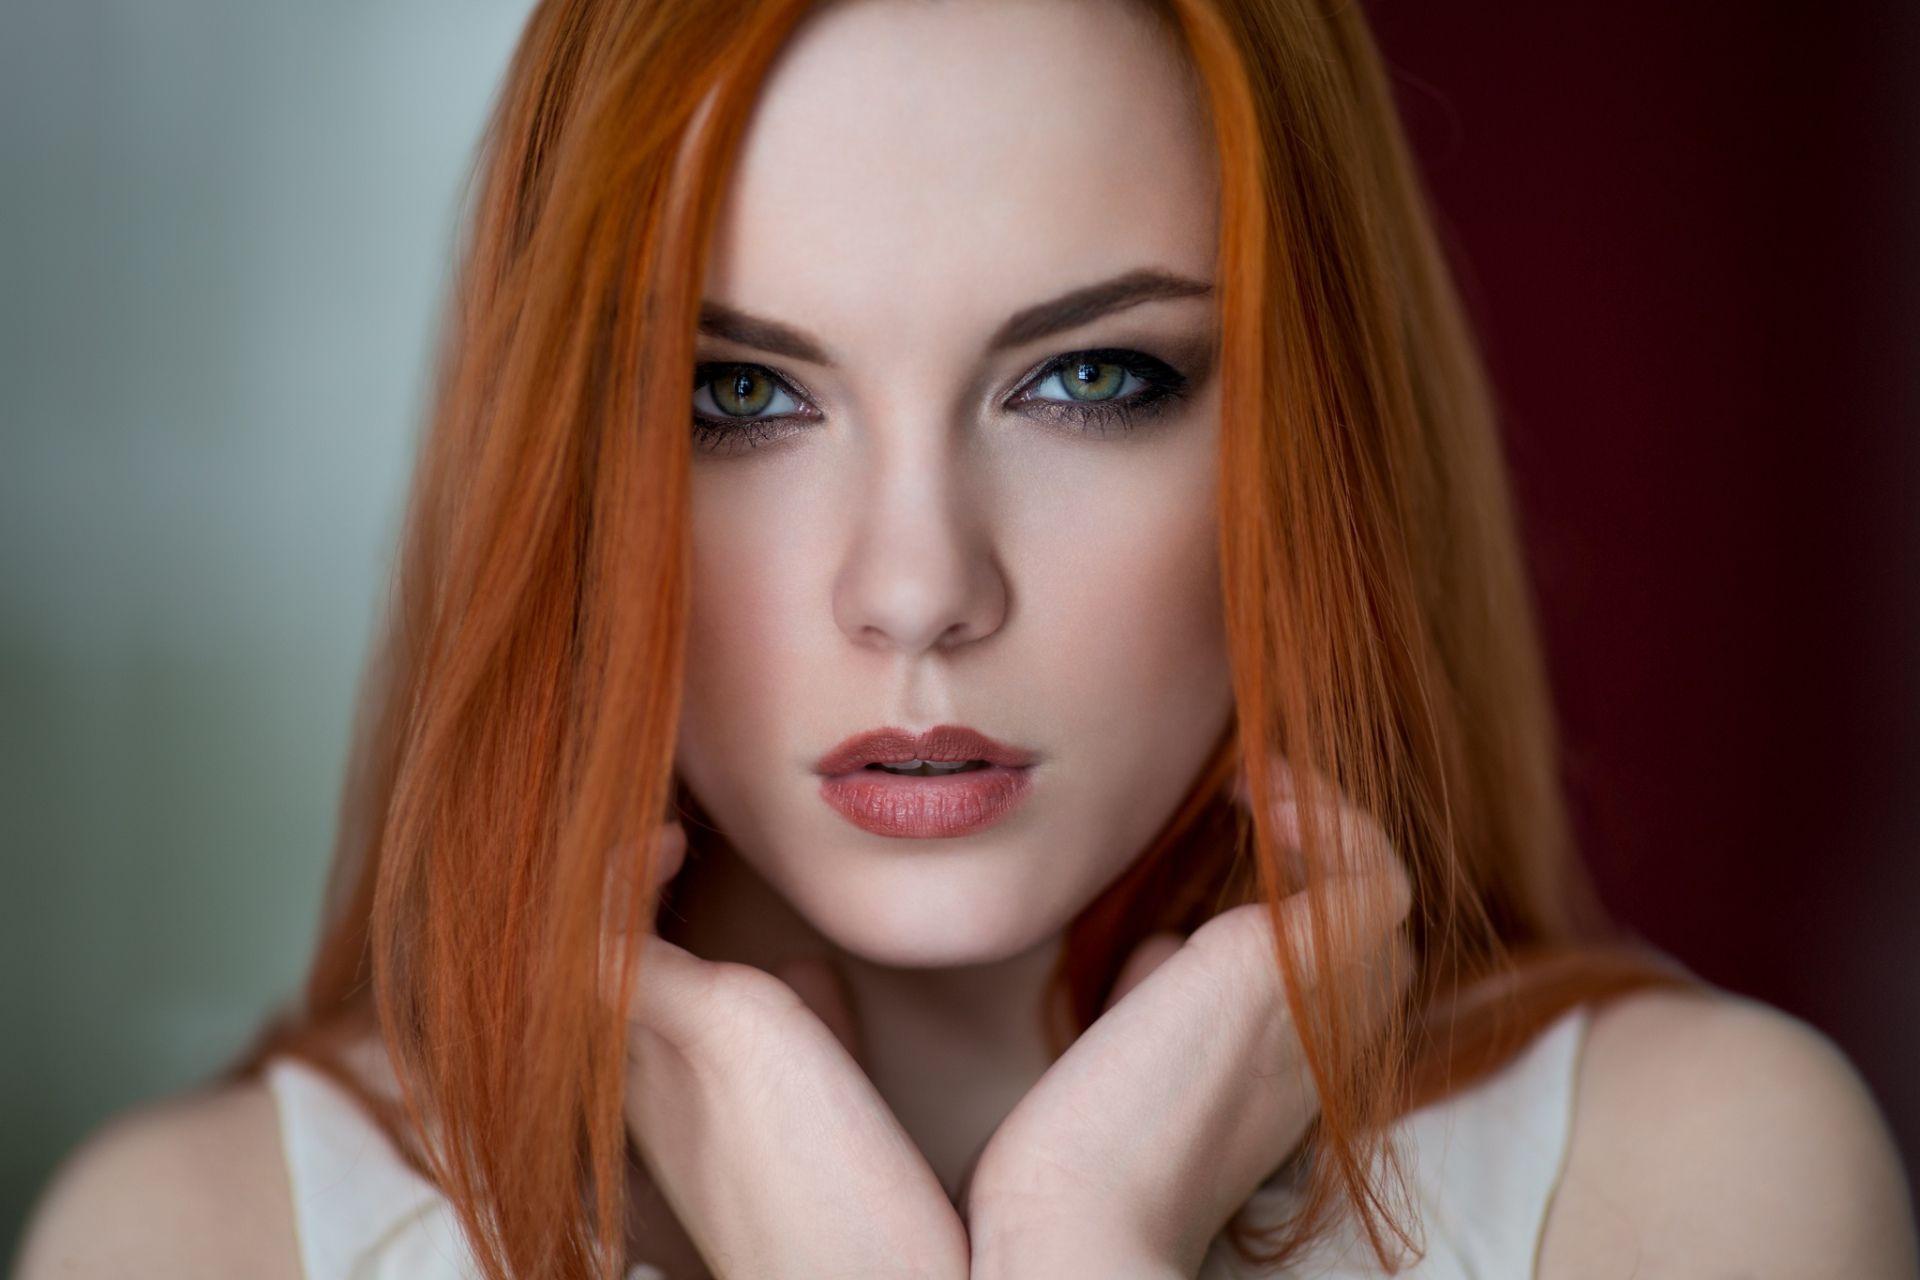 Femmes top model woman green eyes redhead fond dcran beautiful femmes top model woman green eyes redhead fond dcran surreal photospaper wallsbeautiful voltagebd Images